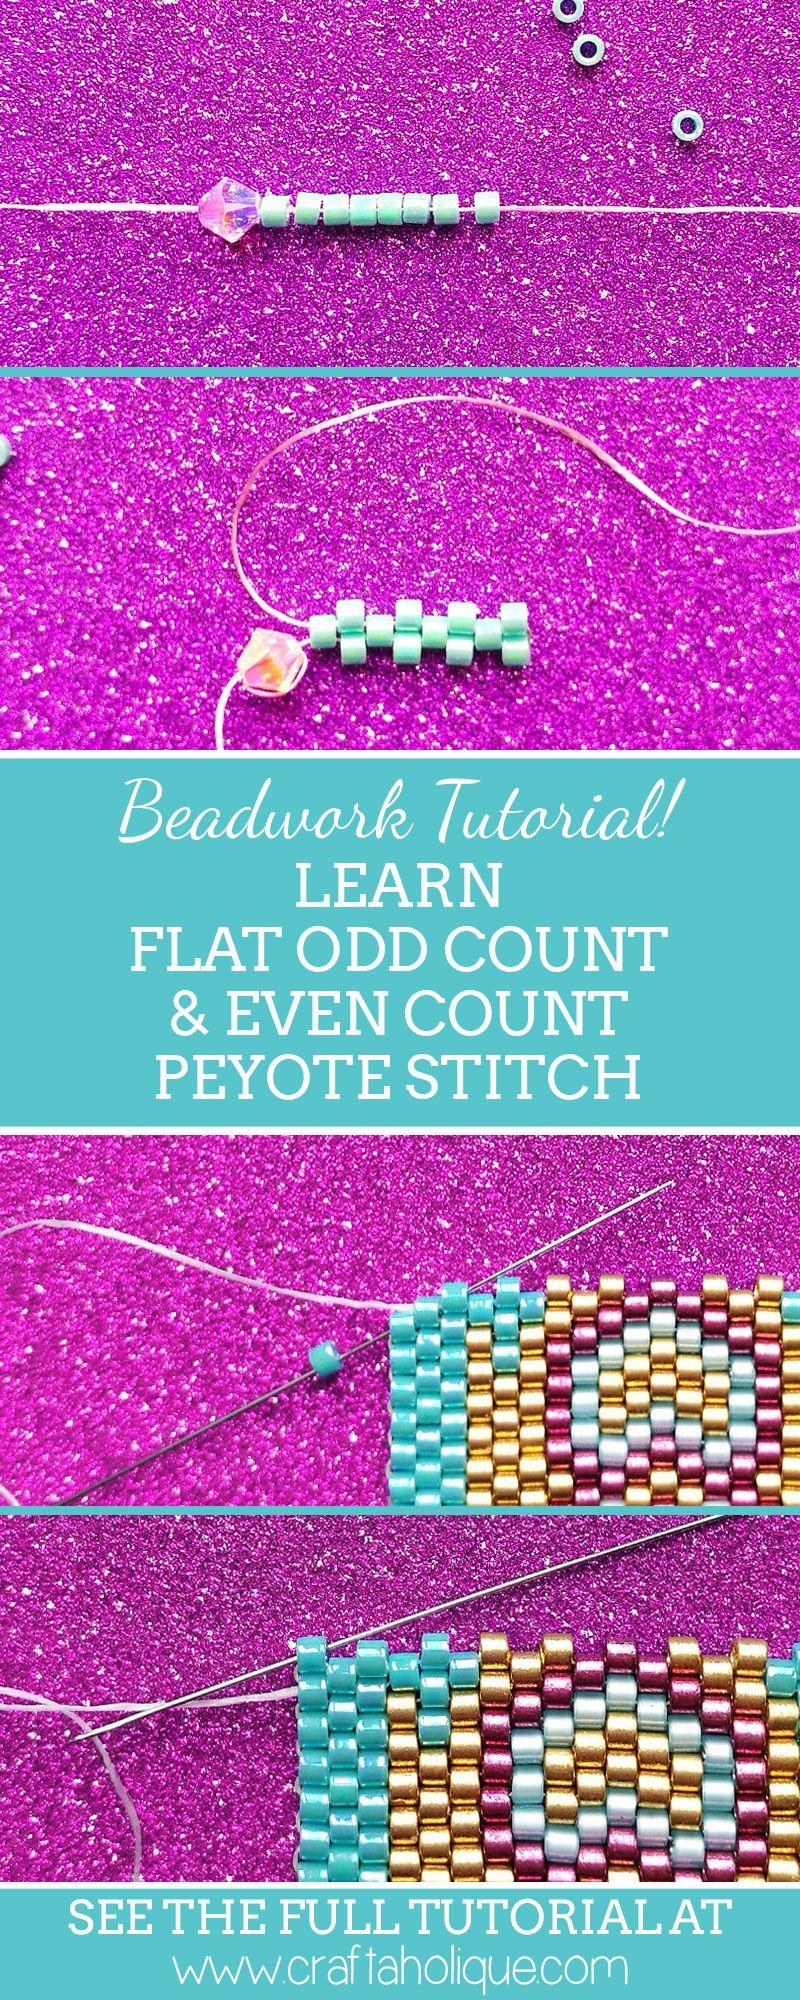 Flat Even Count & Odd Count Peyote Stitch Beadwork Tutorial ...